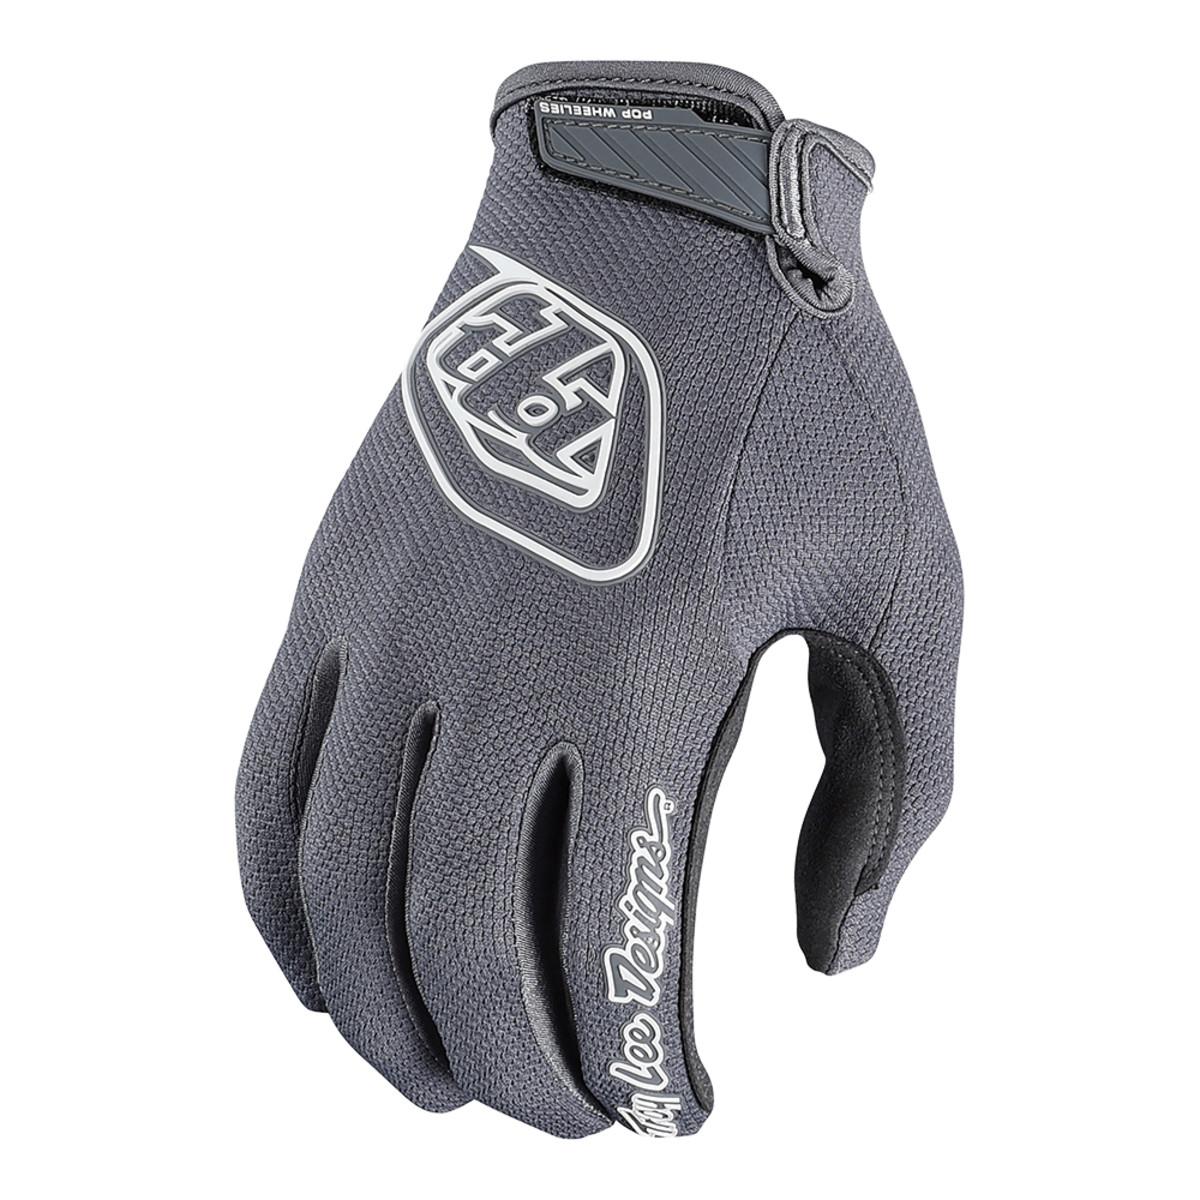 Рукавички Troy Lee Designs Air Glove, сірі